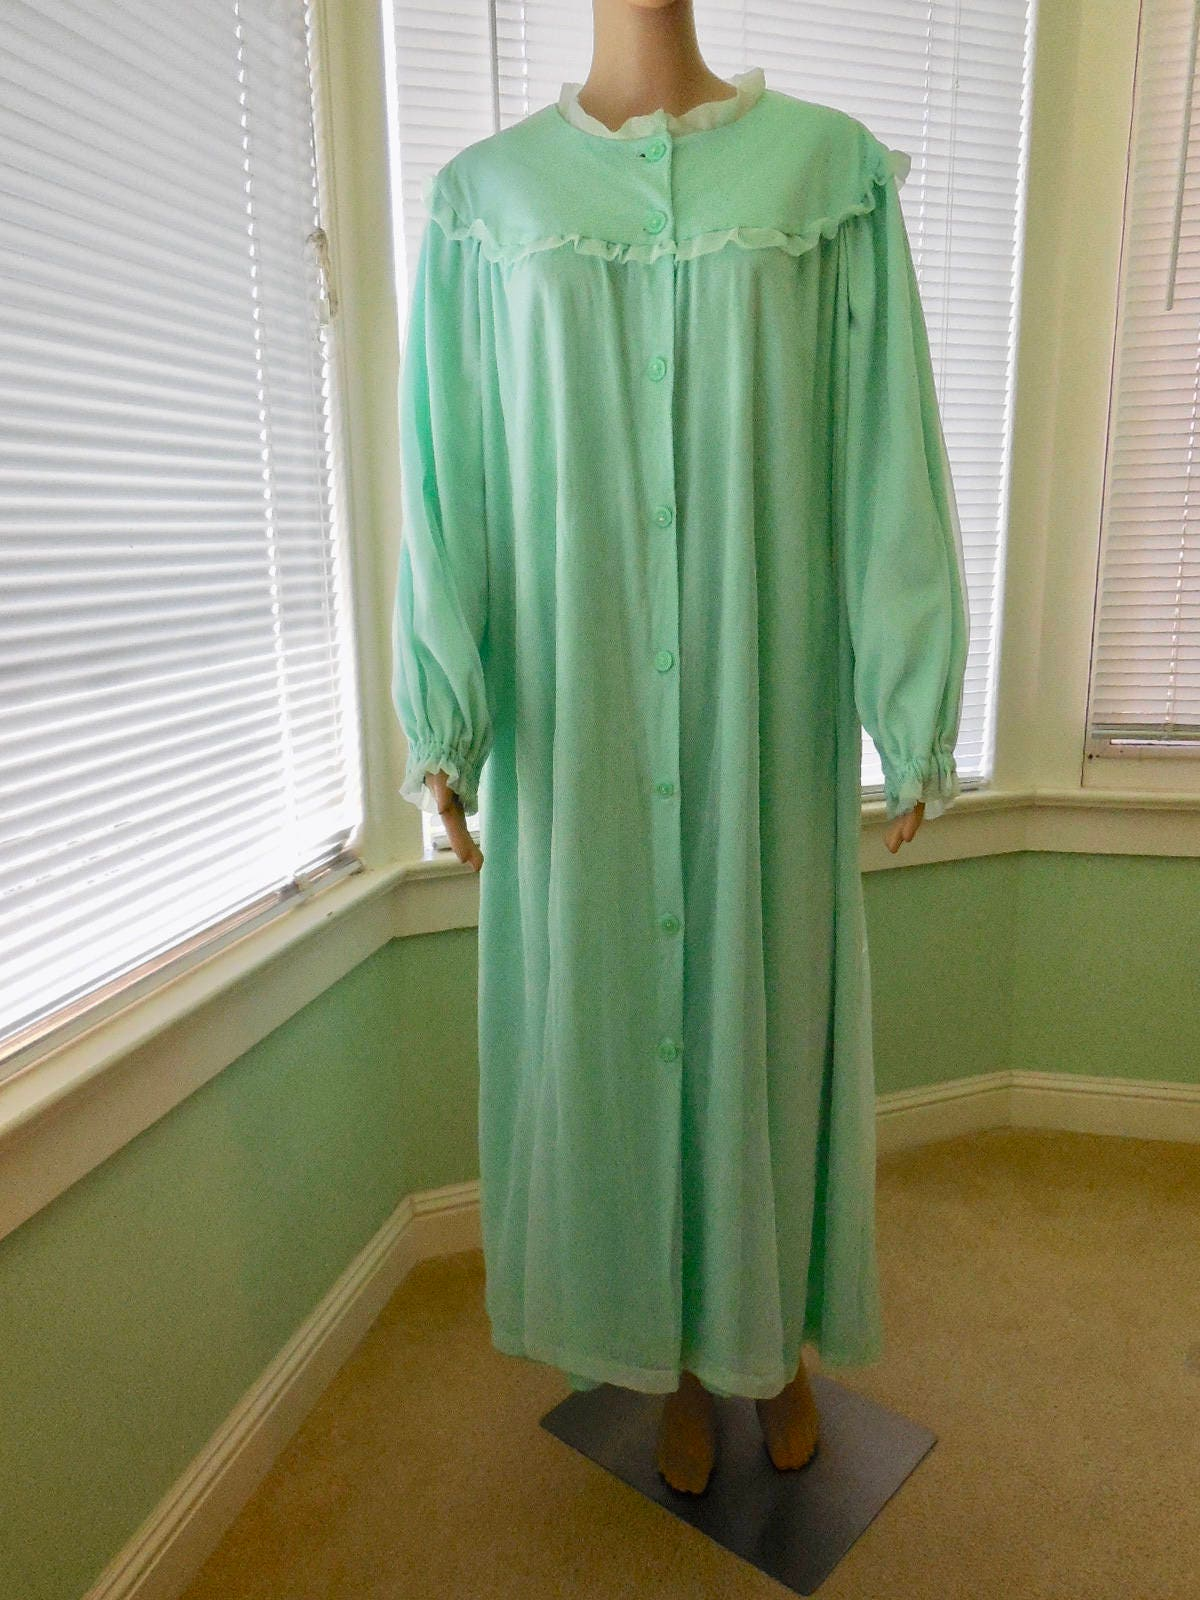 9e98c35589652 Vintage CHIFFON ROBE 50s Chiffon House Robe Peignoir Chiffon